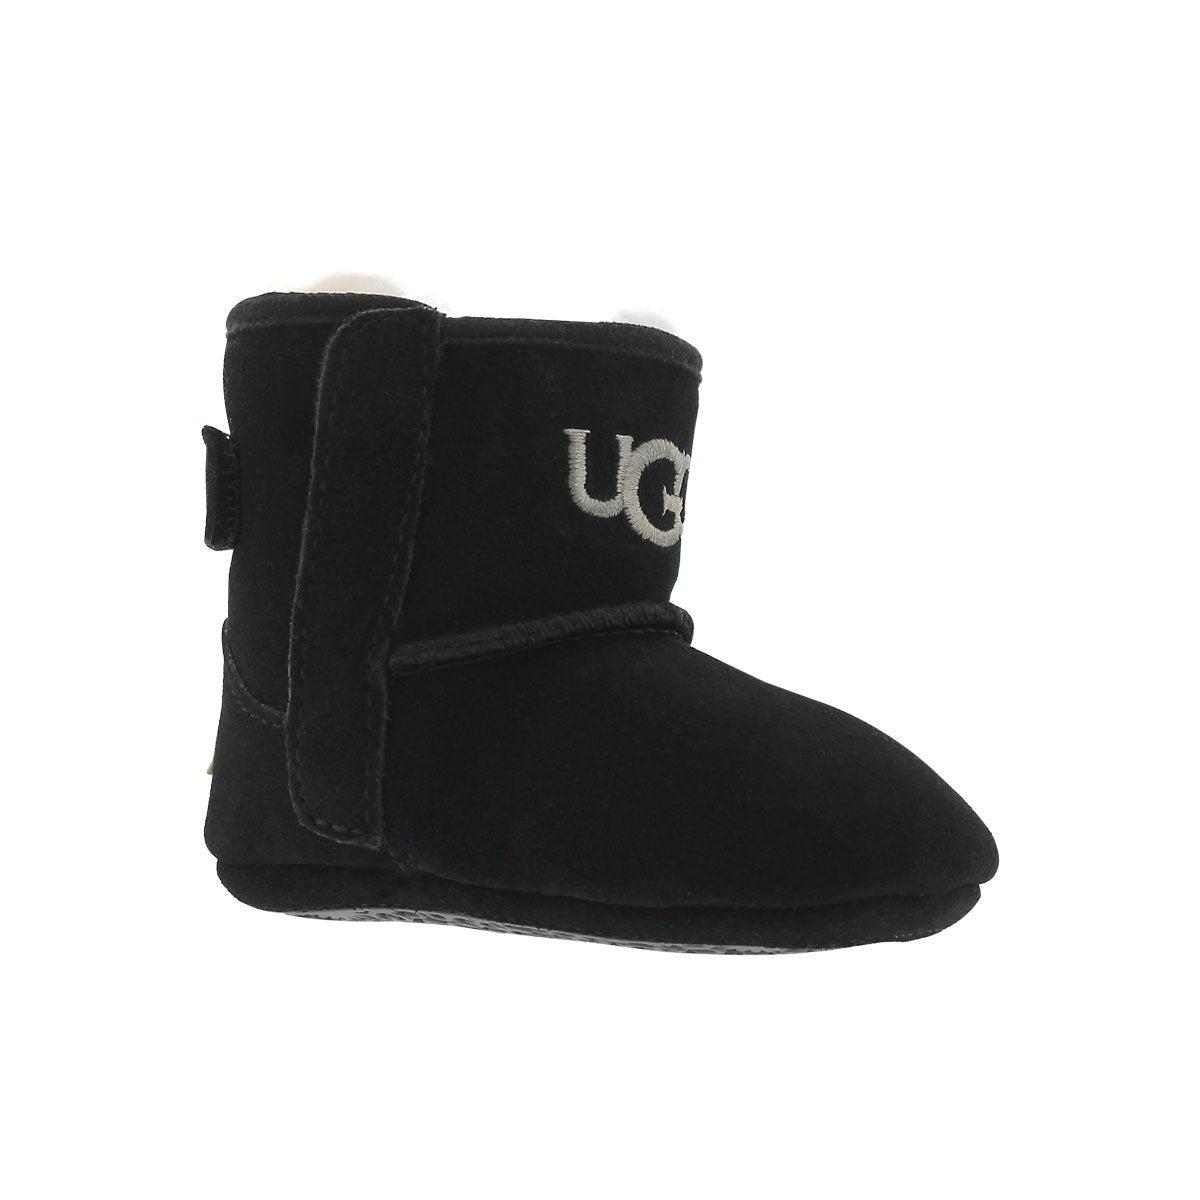 Infants' JESSE II black fashion boots